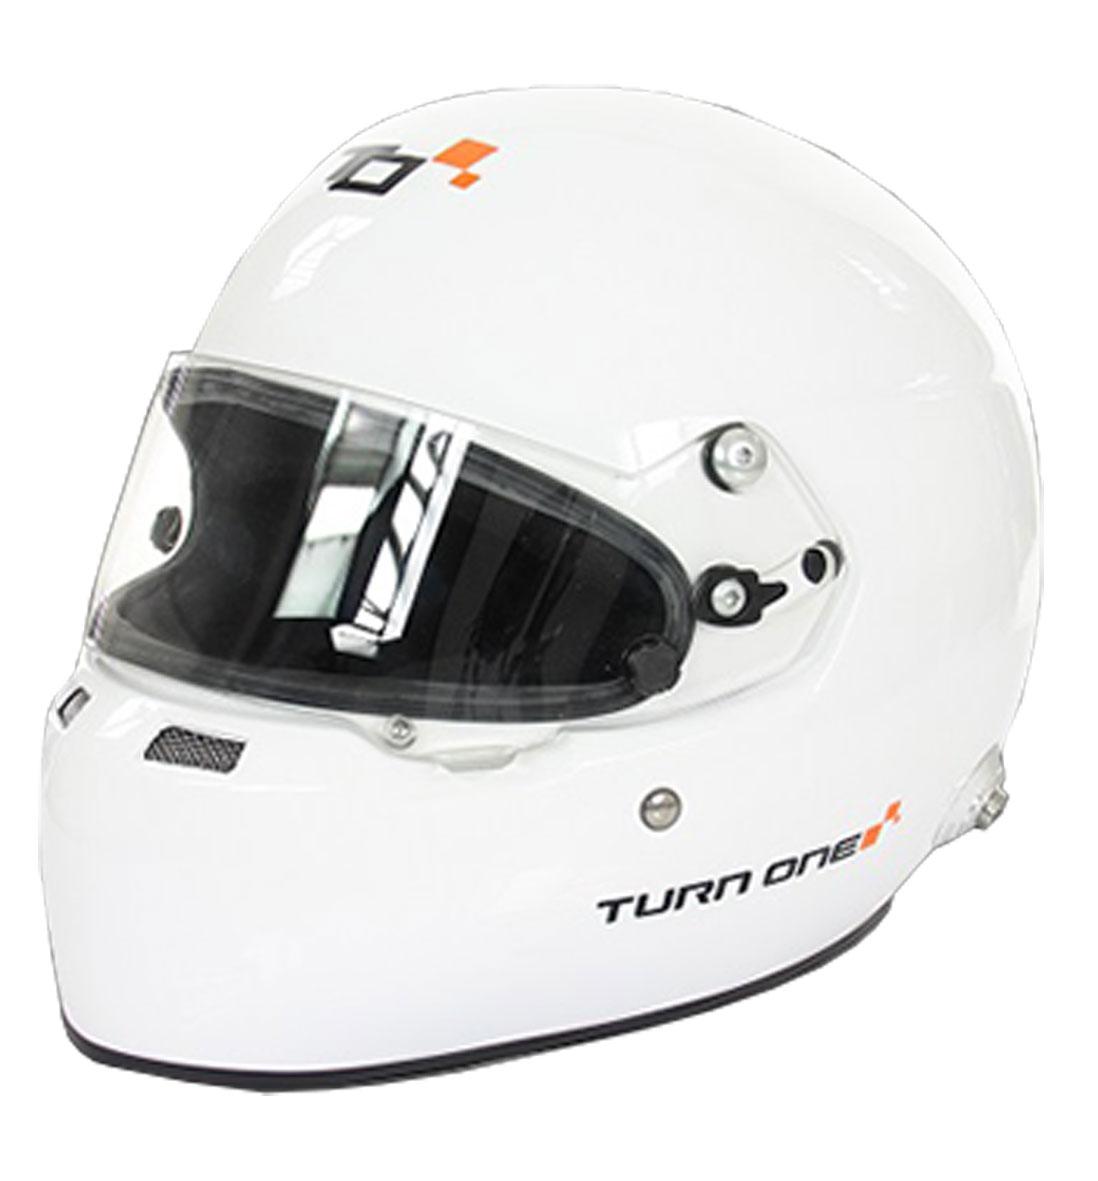 Turn One Full-RS Helmet | FIA8859-15 | White | Small (55)